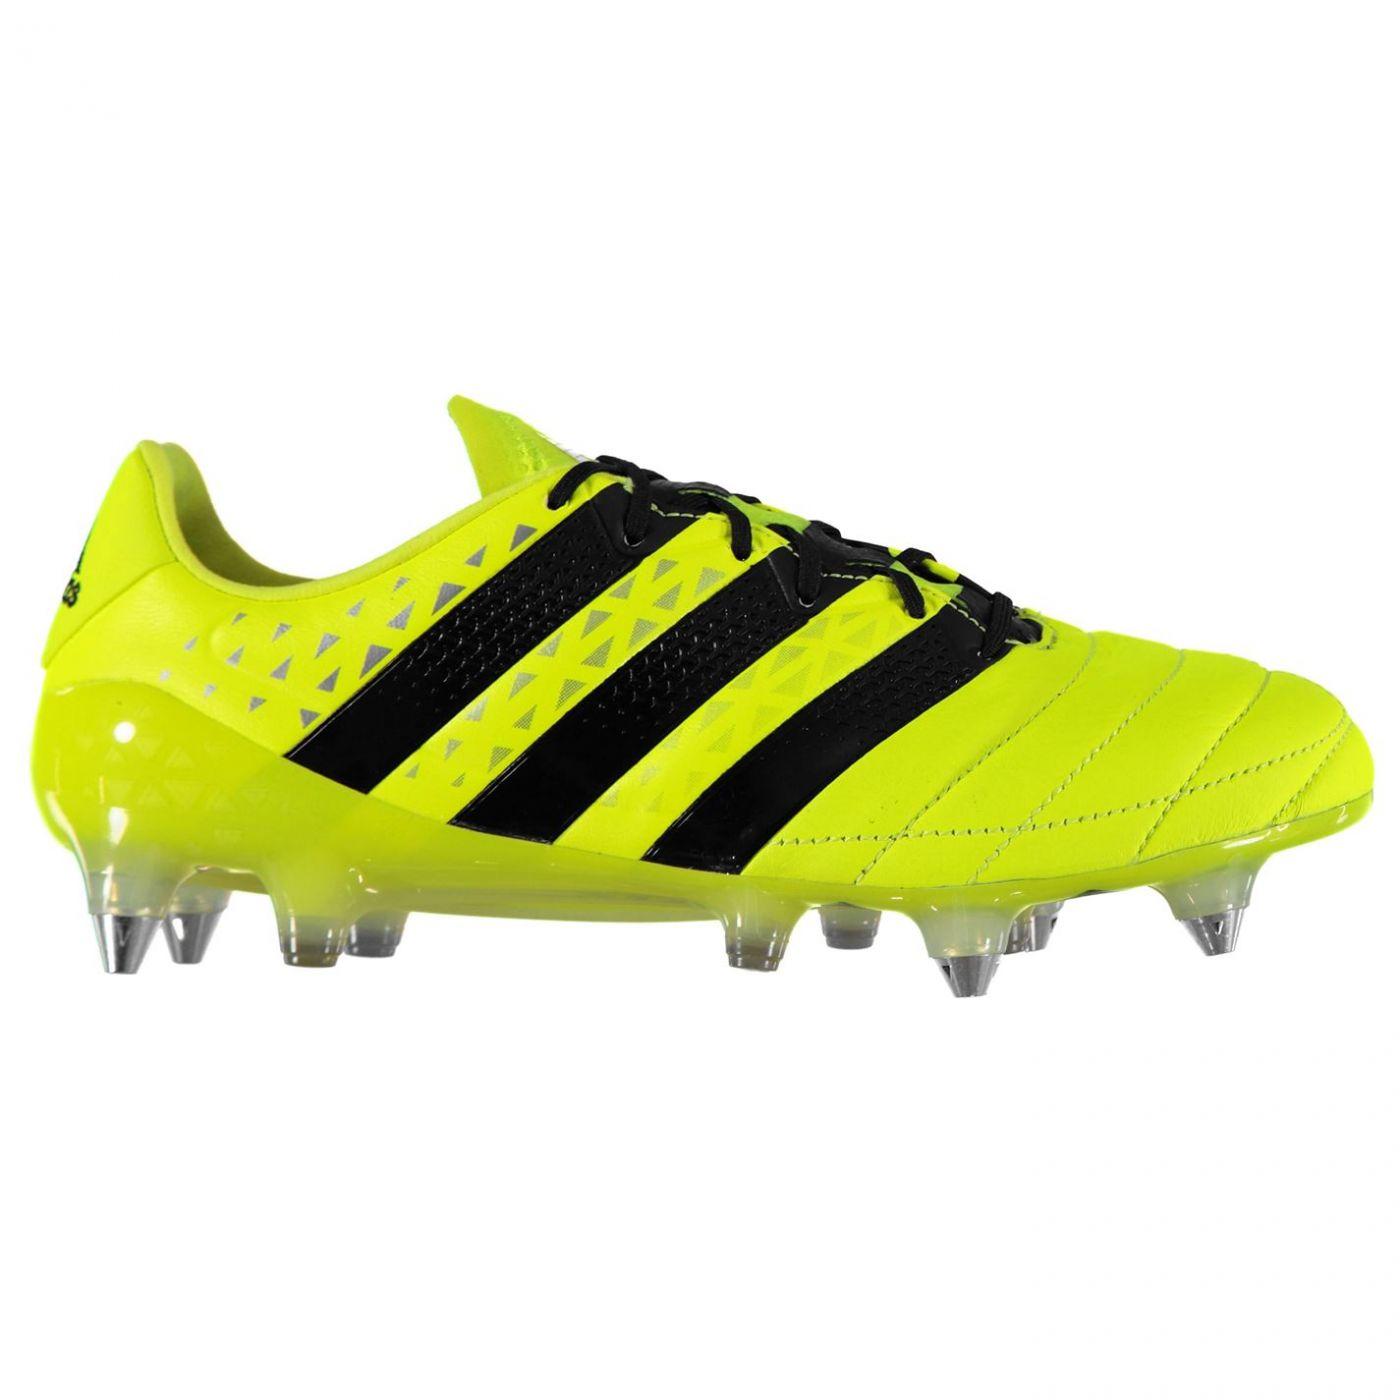 Adidas Ace 16.1 SG Men's Football Boots